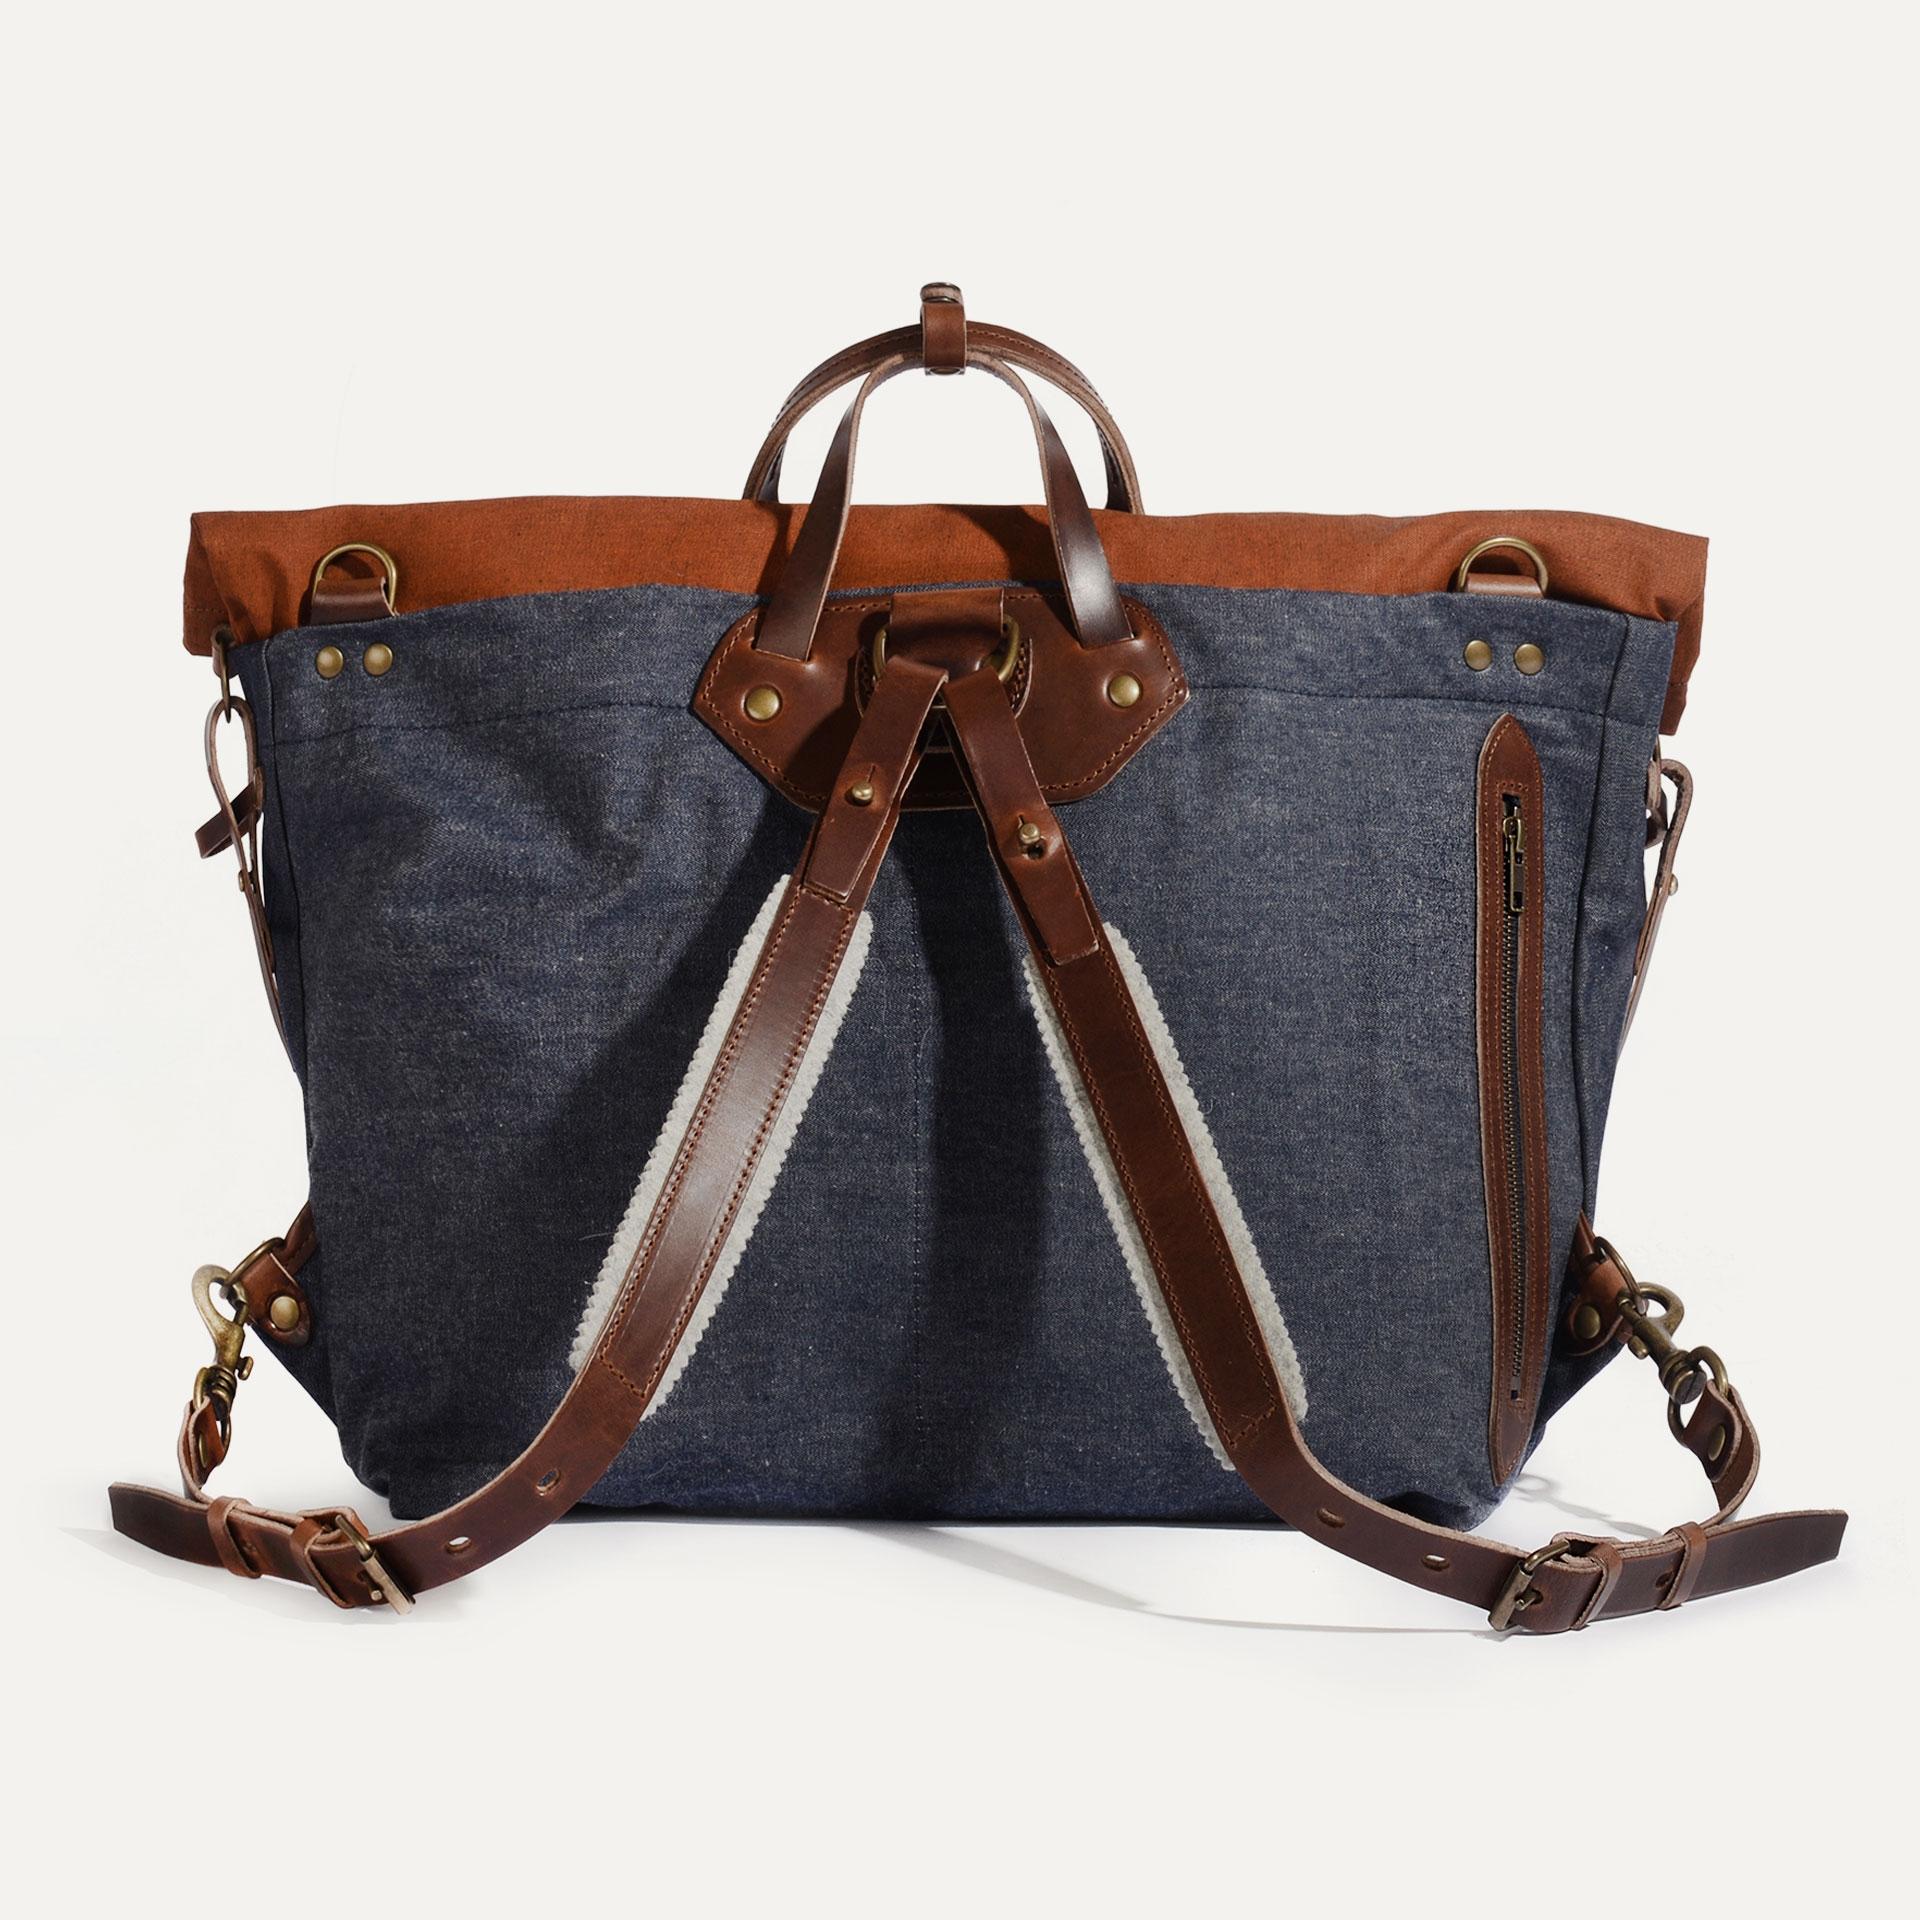 Woody L Backpack - Denim/Terra cotta (image n°2)